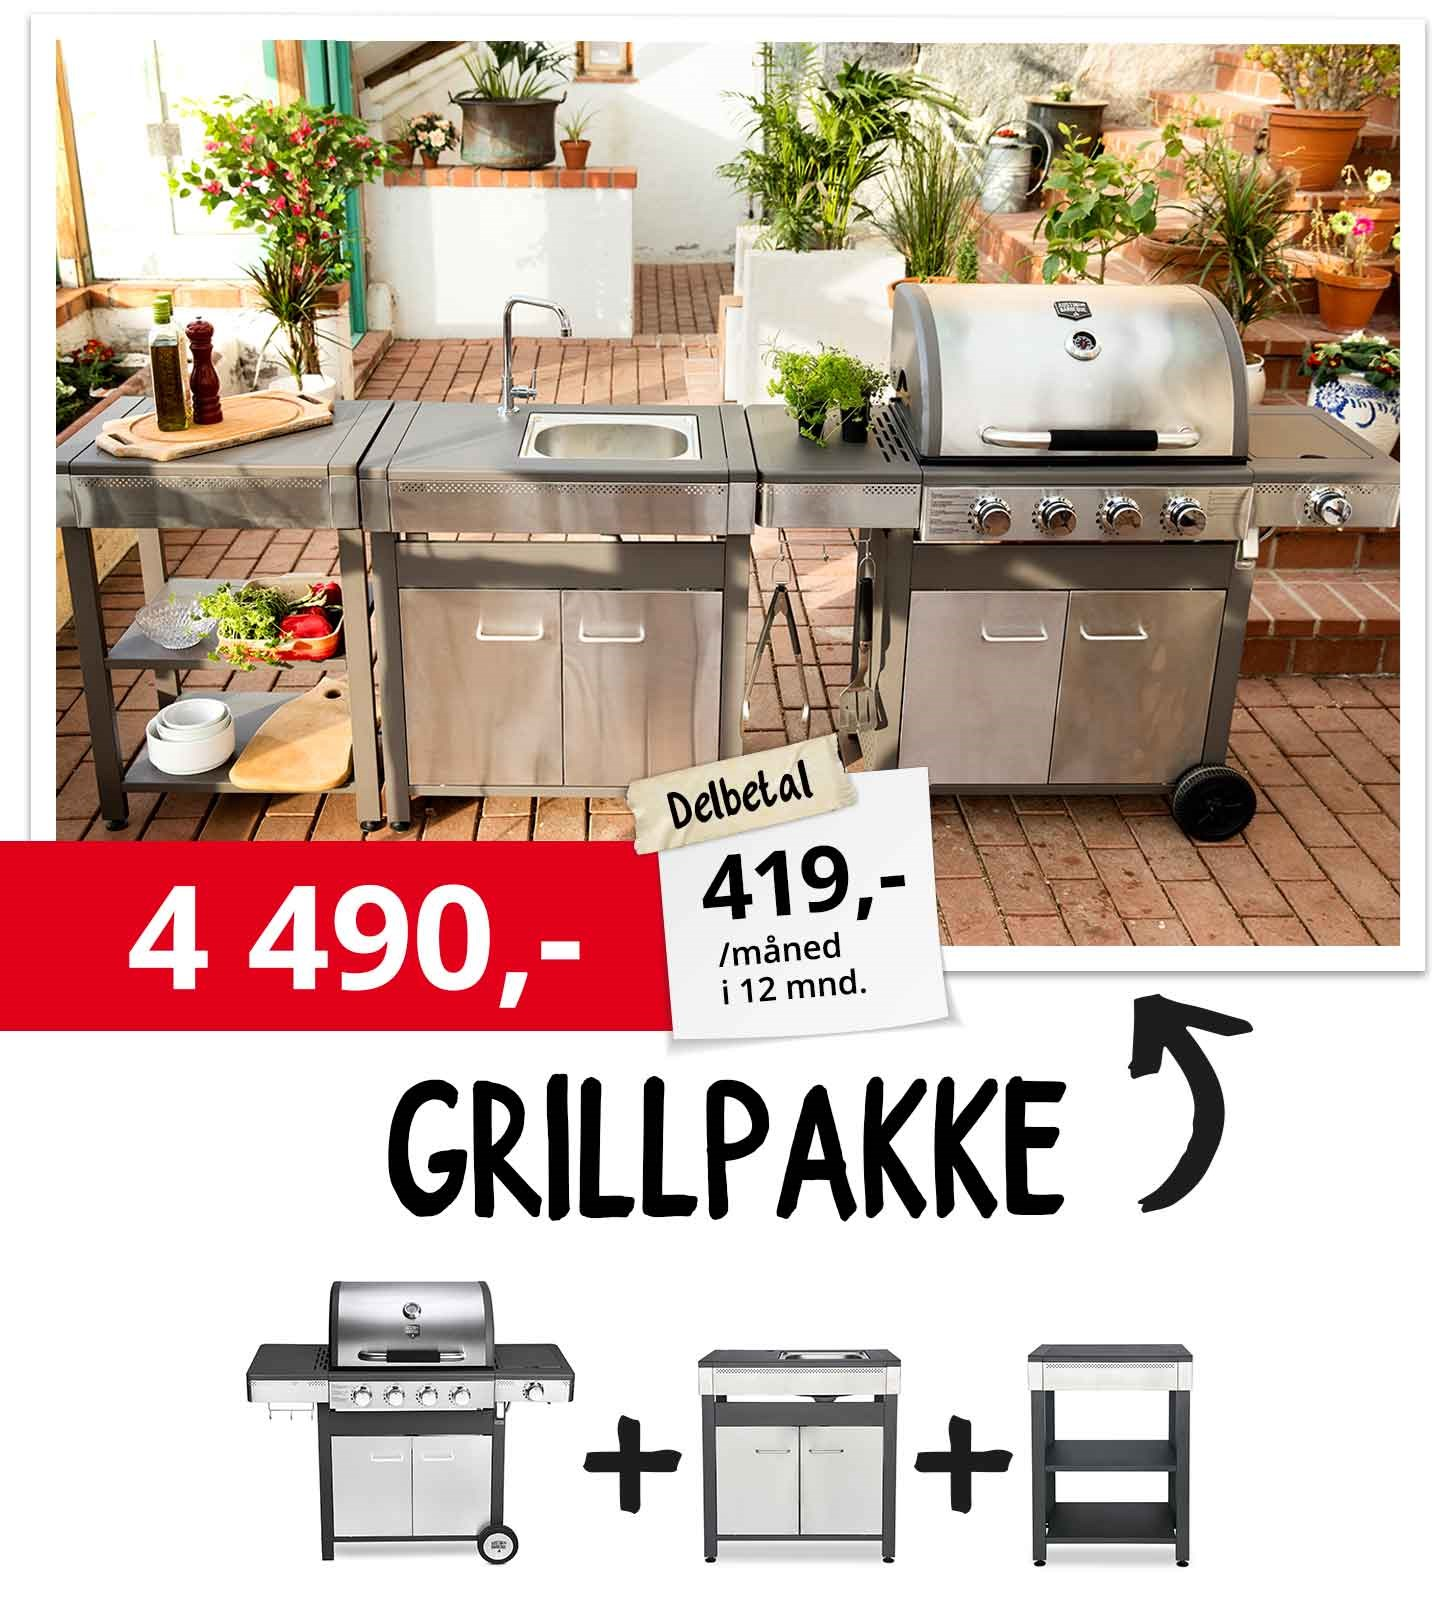 Grillpakke 5990,-